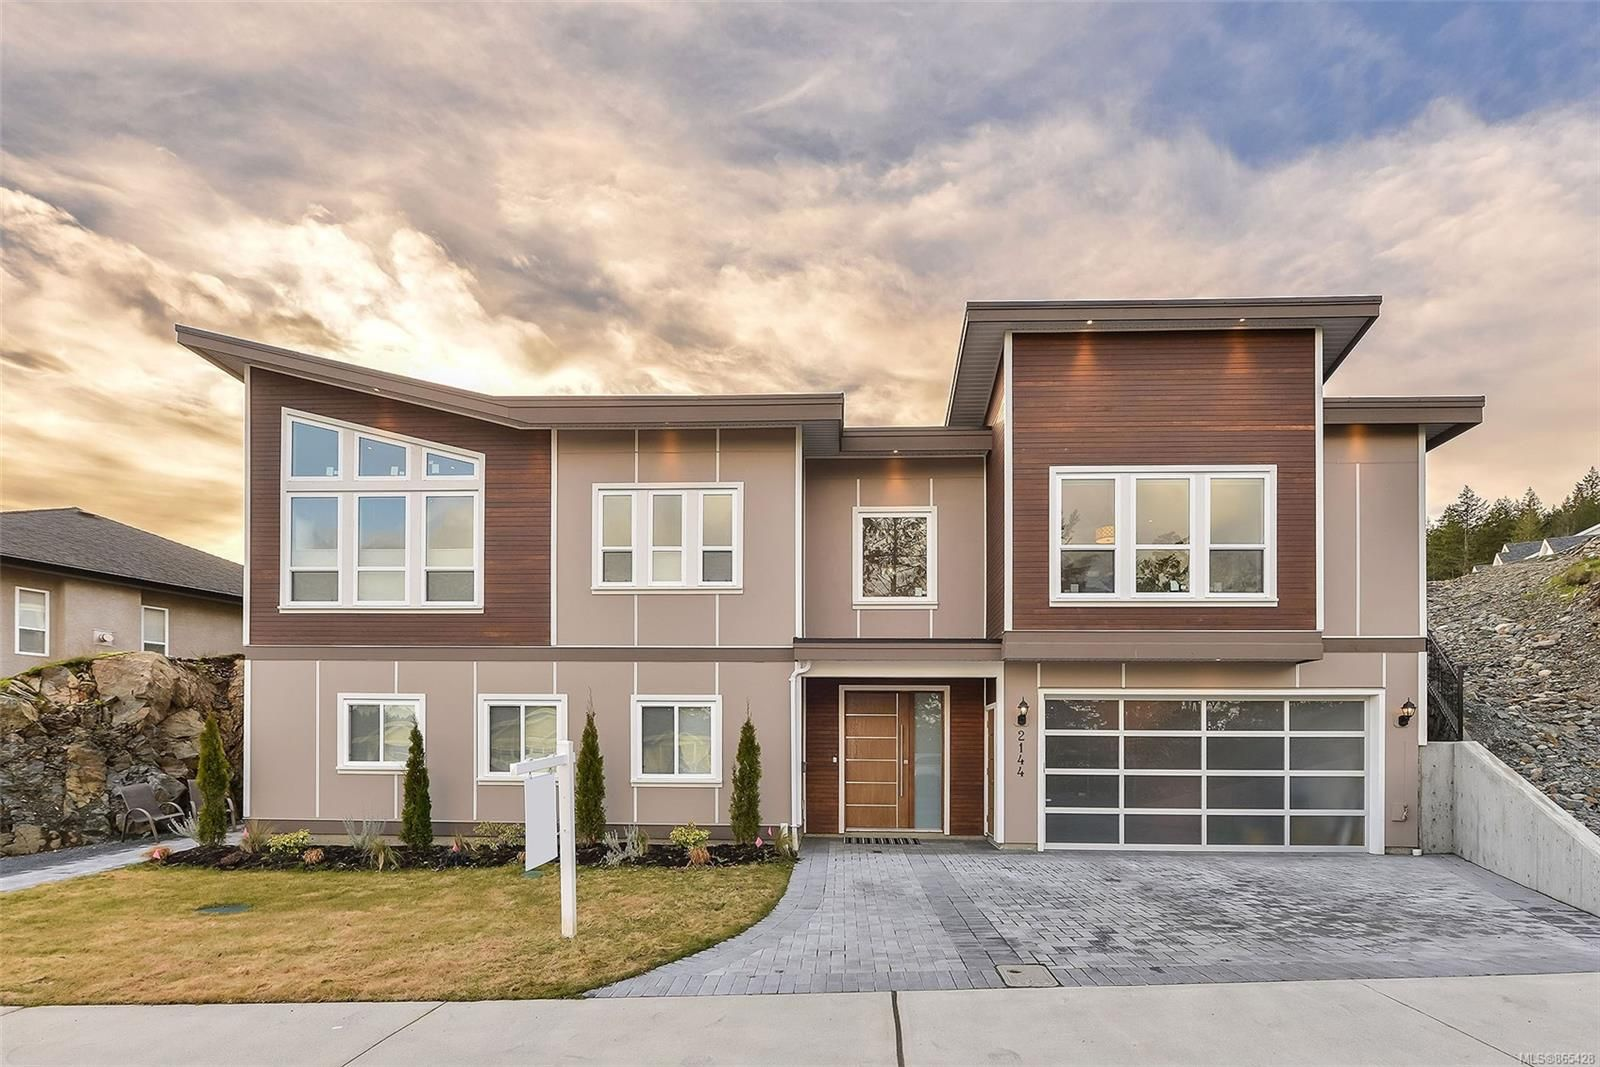 Main Photo: 2144 Kingbird Dr in : La Bear Mountain House for sale (Langford)  : MLS®# 865428